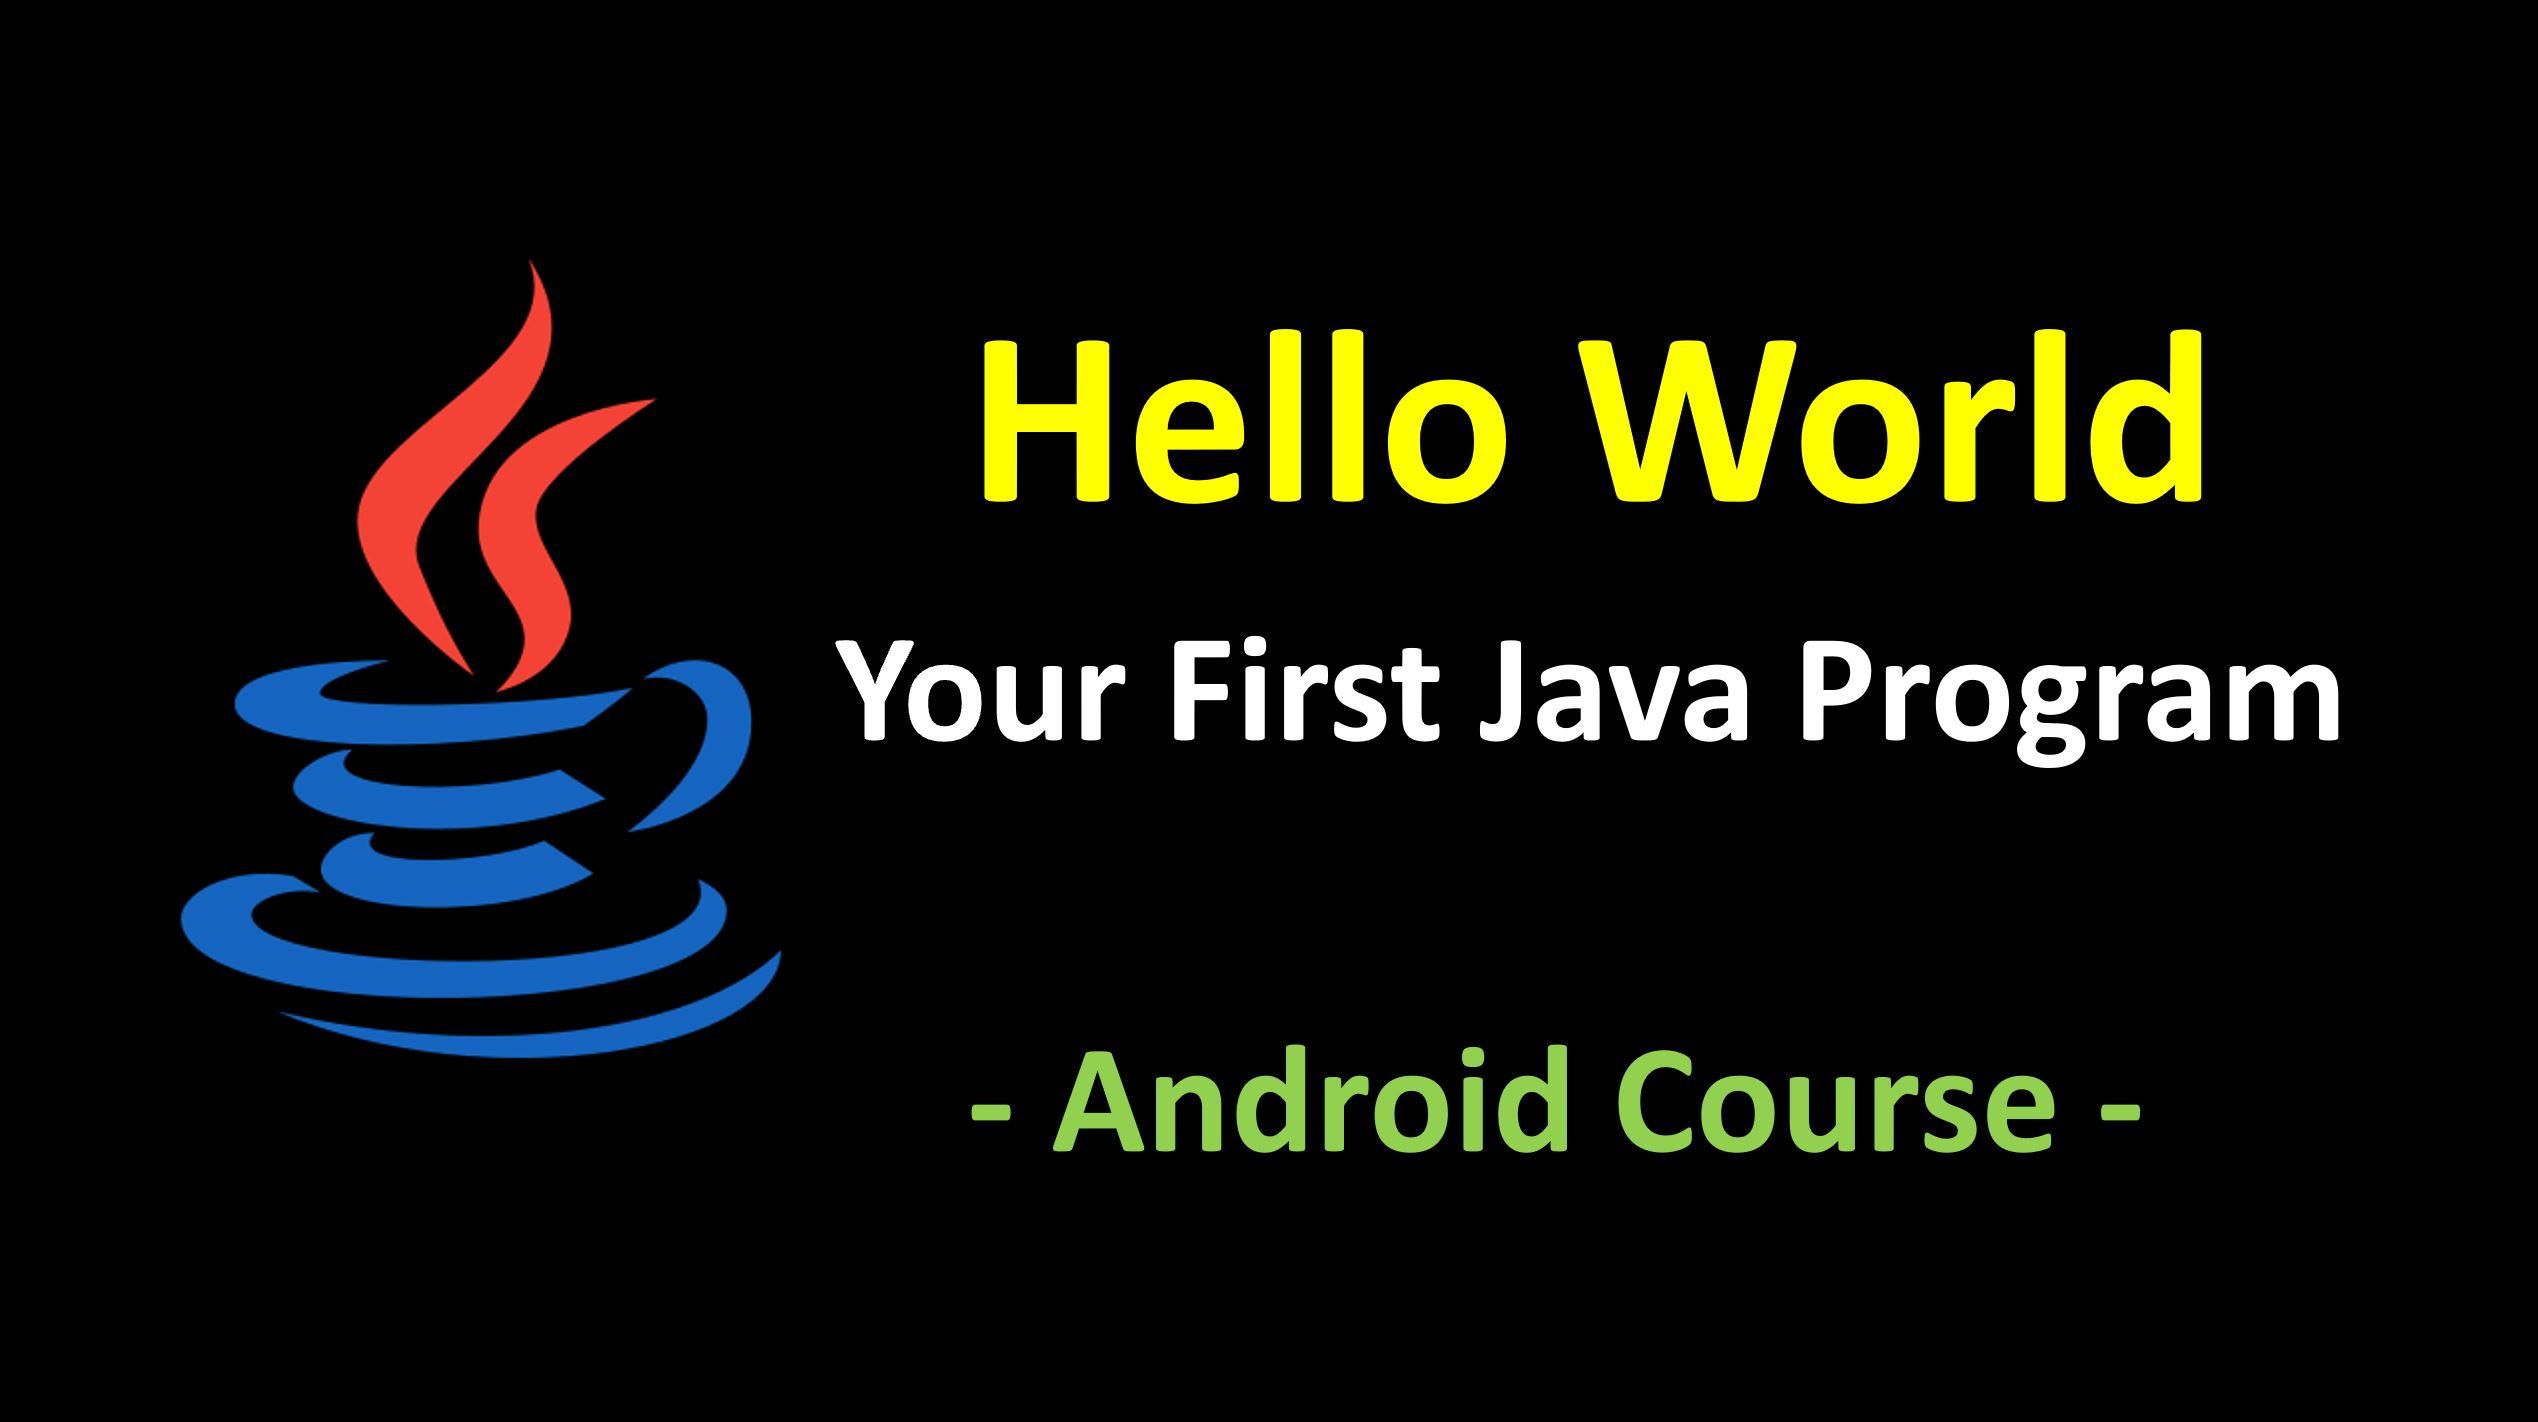 Your First Java Program - Hello World